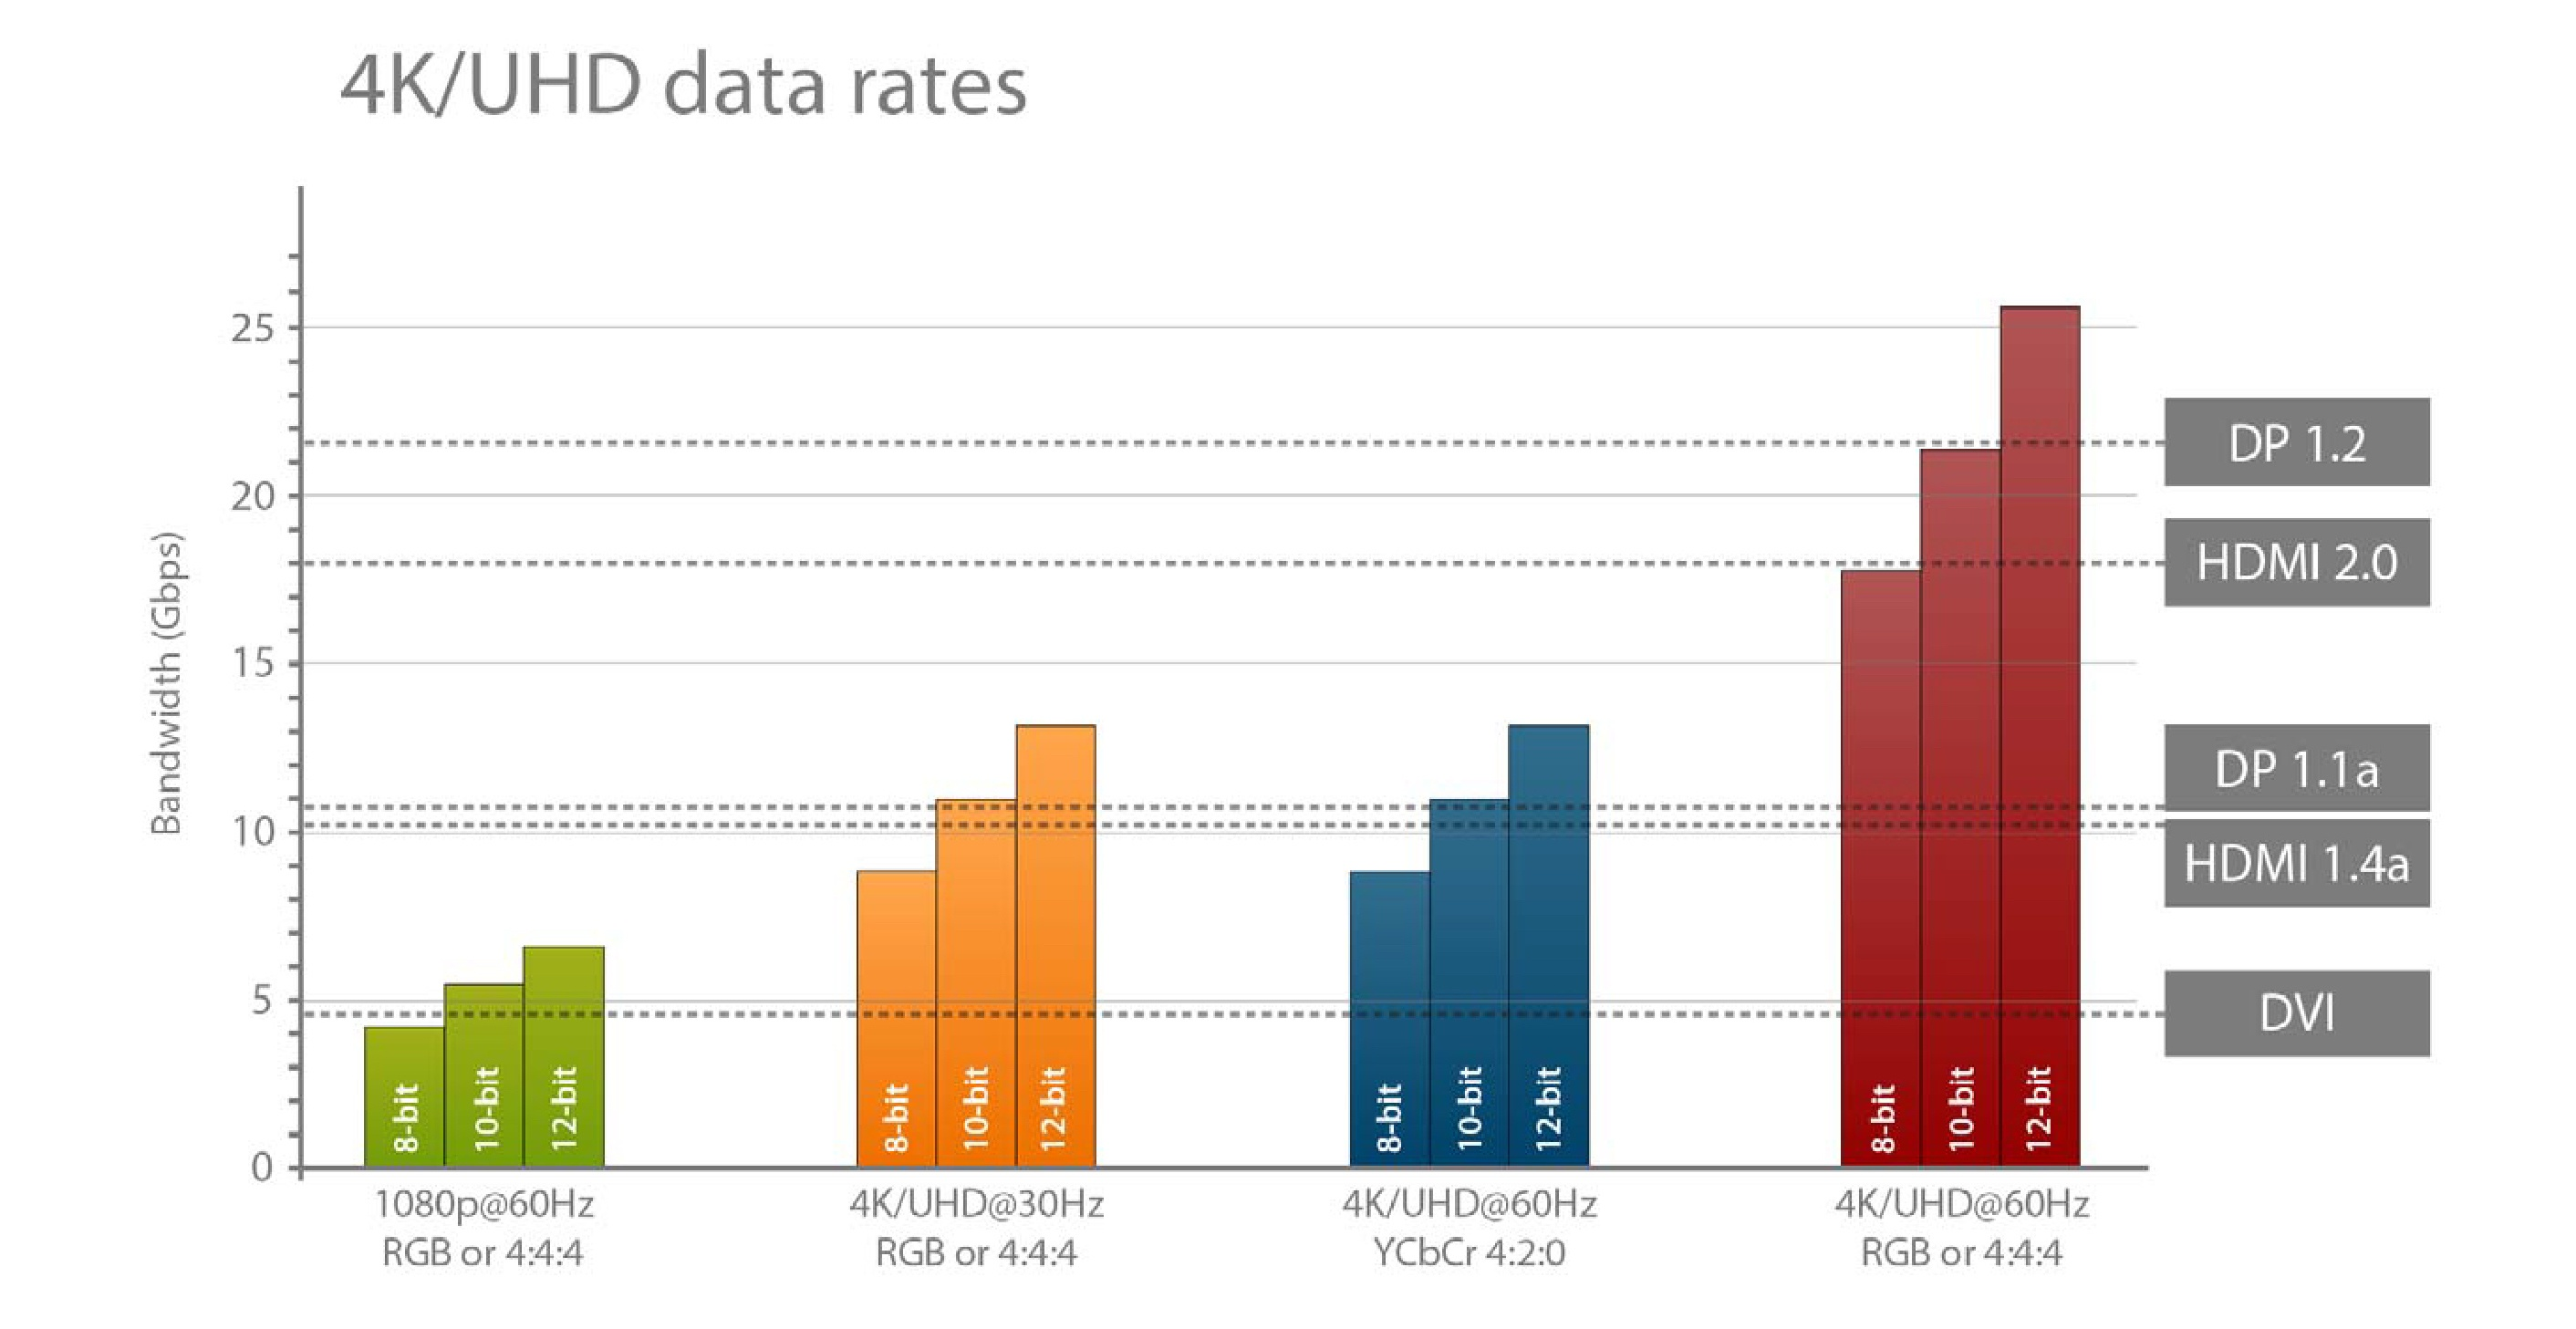 4K /UHD data rates